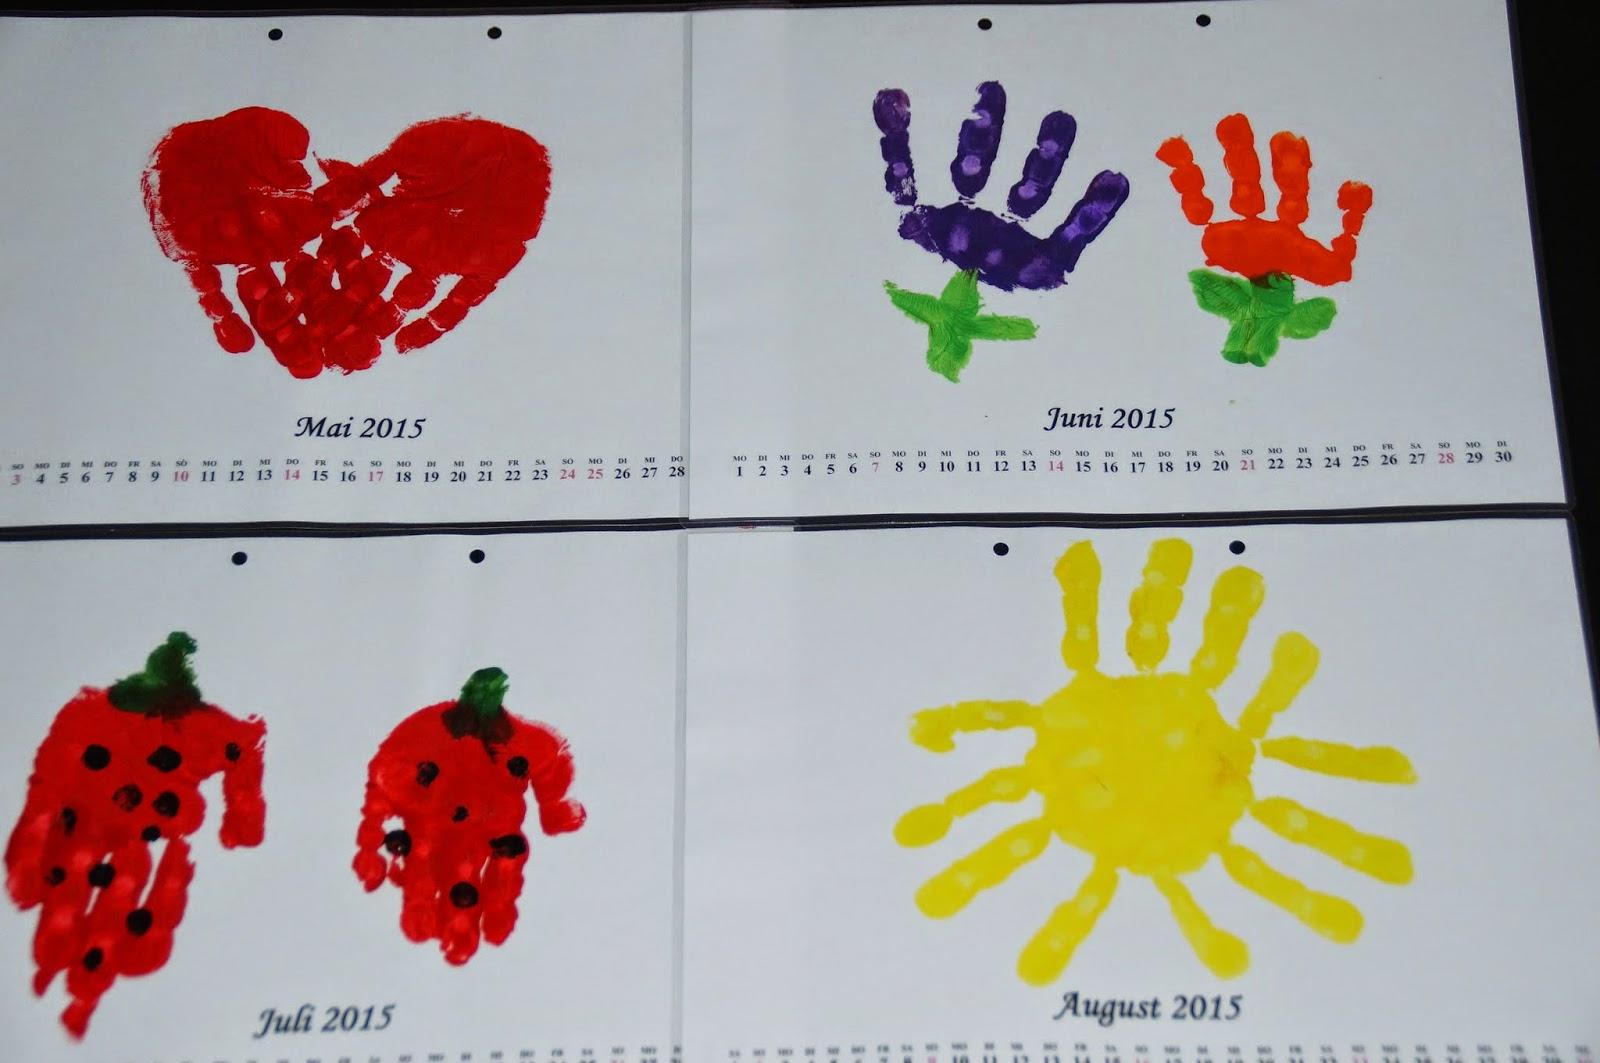 farbenfrohe kinkerlitzchen kalender aus handabdr cken. Black Bedroom Furniture Sets. Home Design Ideas